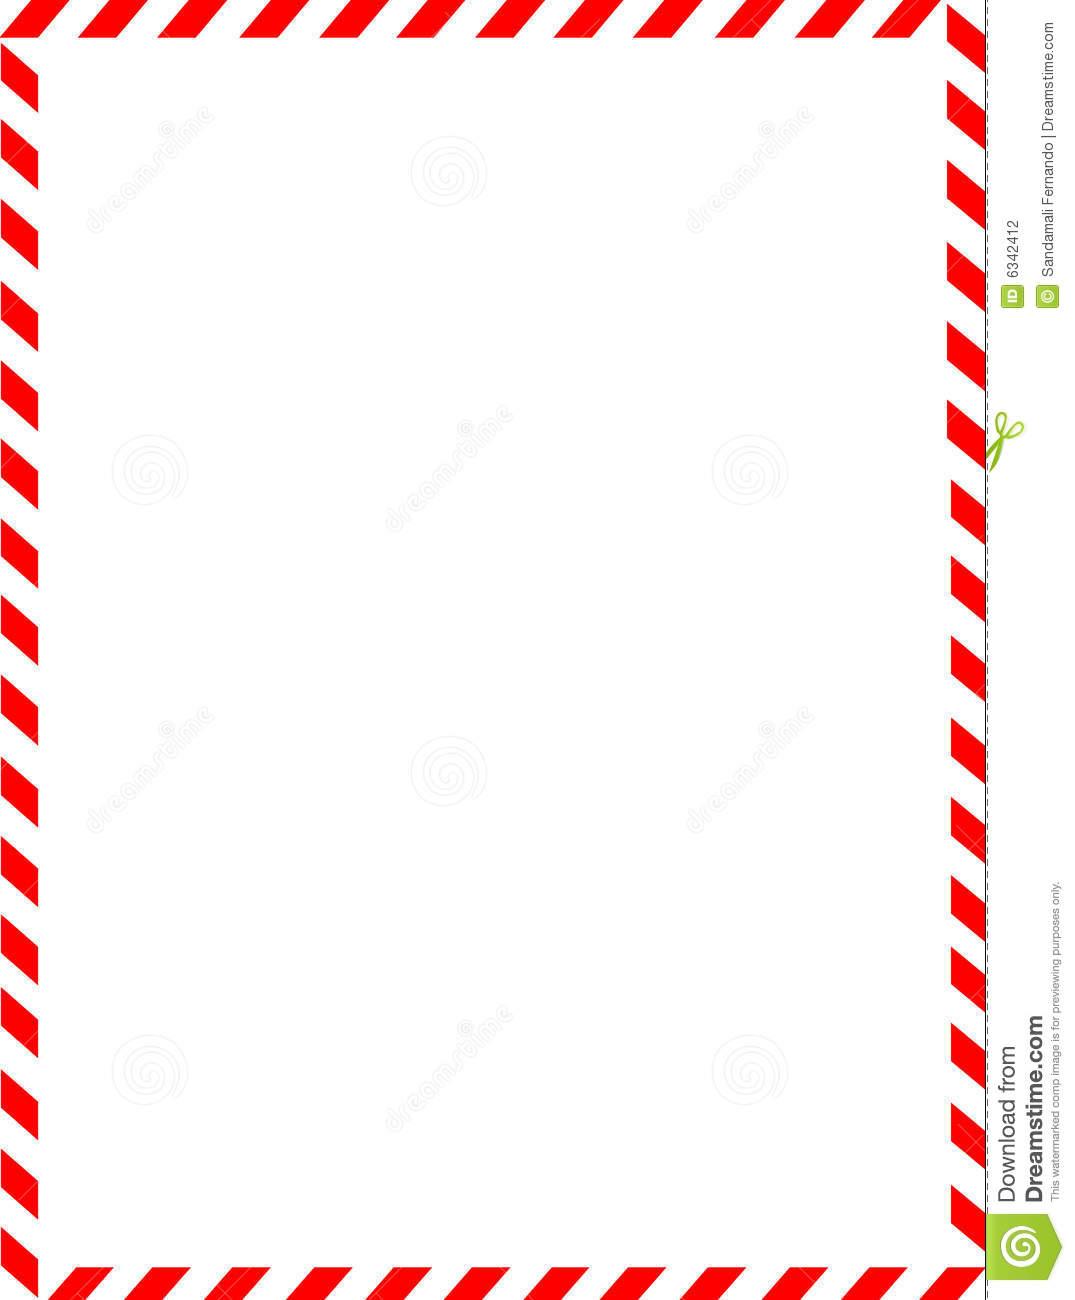 1075x1300 Candy Cane Border Clip Art Free Many Interesting Cliparts